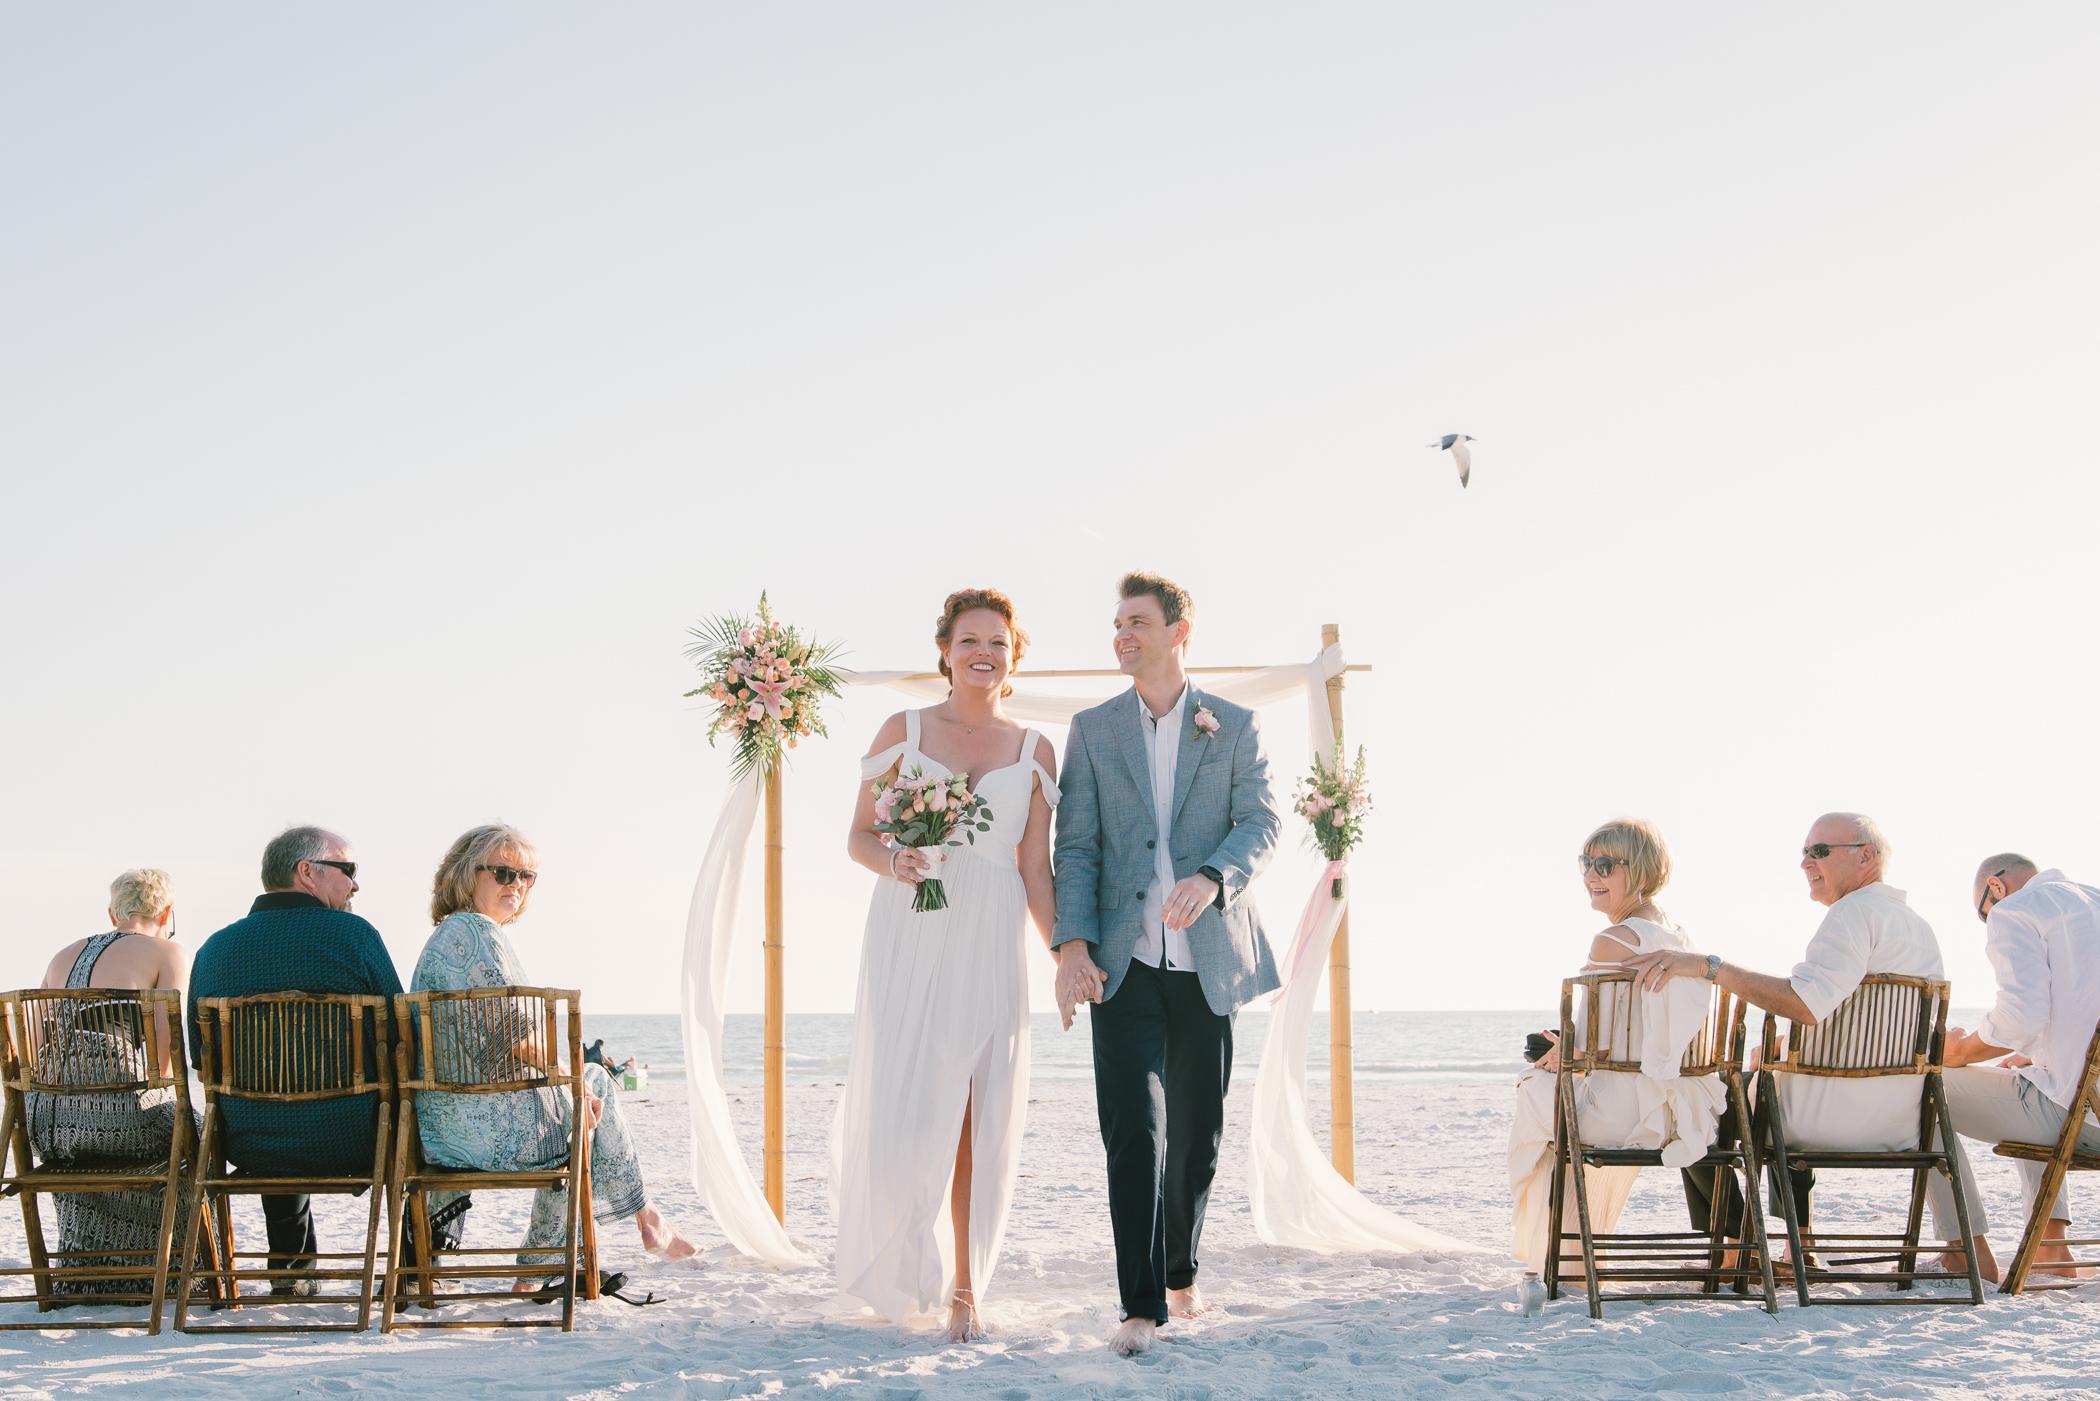 Tide-the-knot-beach-weddings-ceremony, beach-wedding-in-Florida, Tampa-wedding-photographer